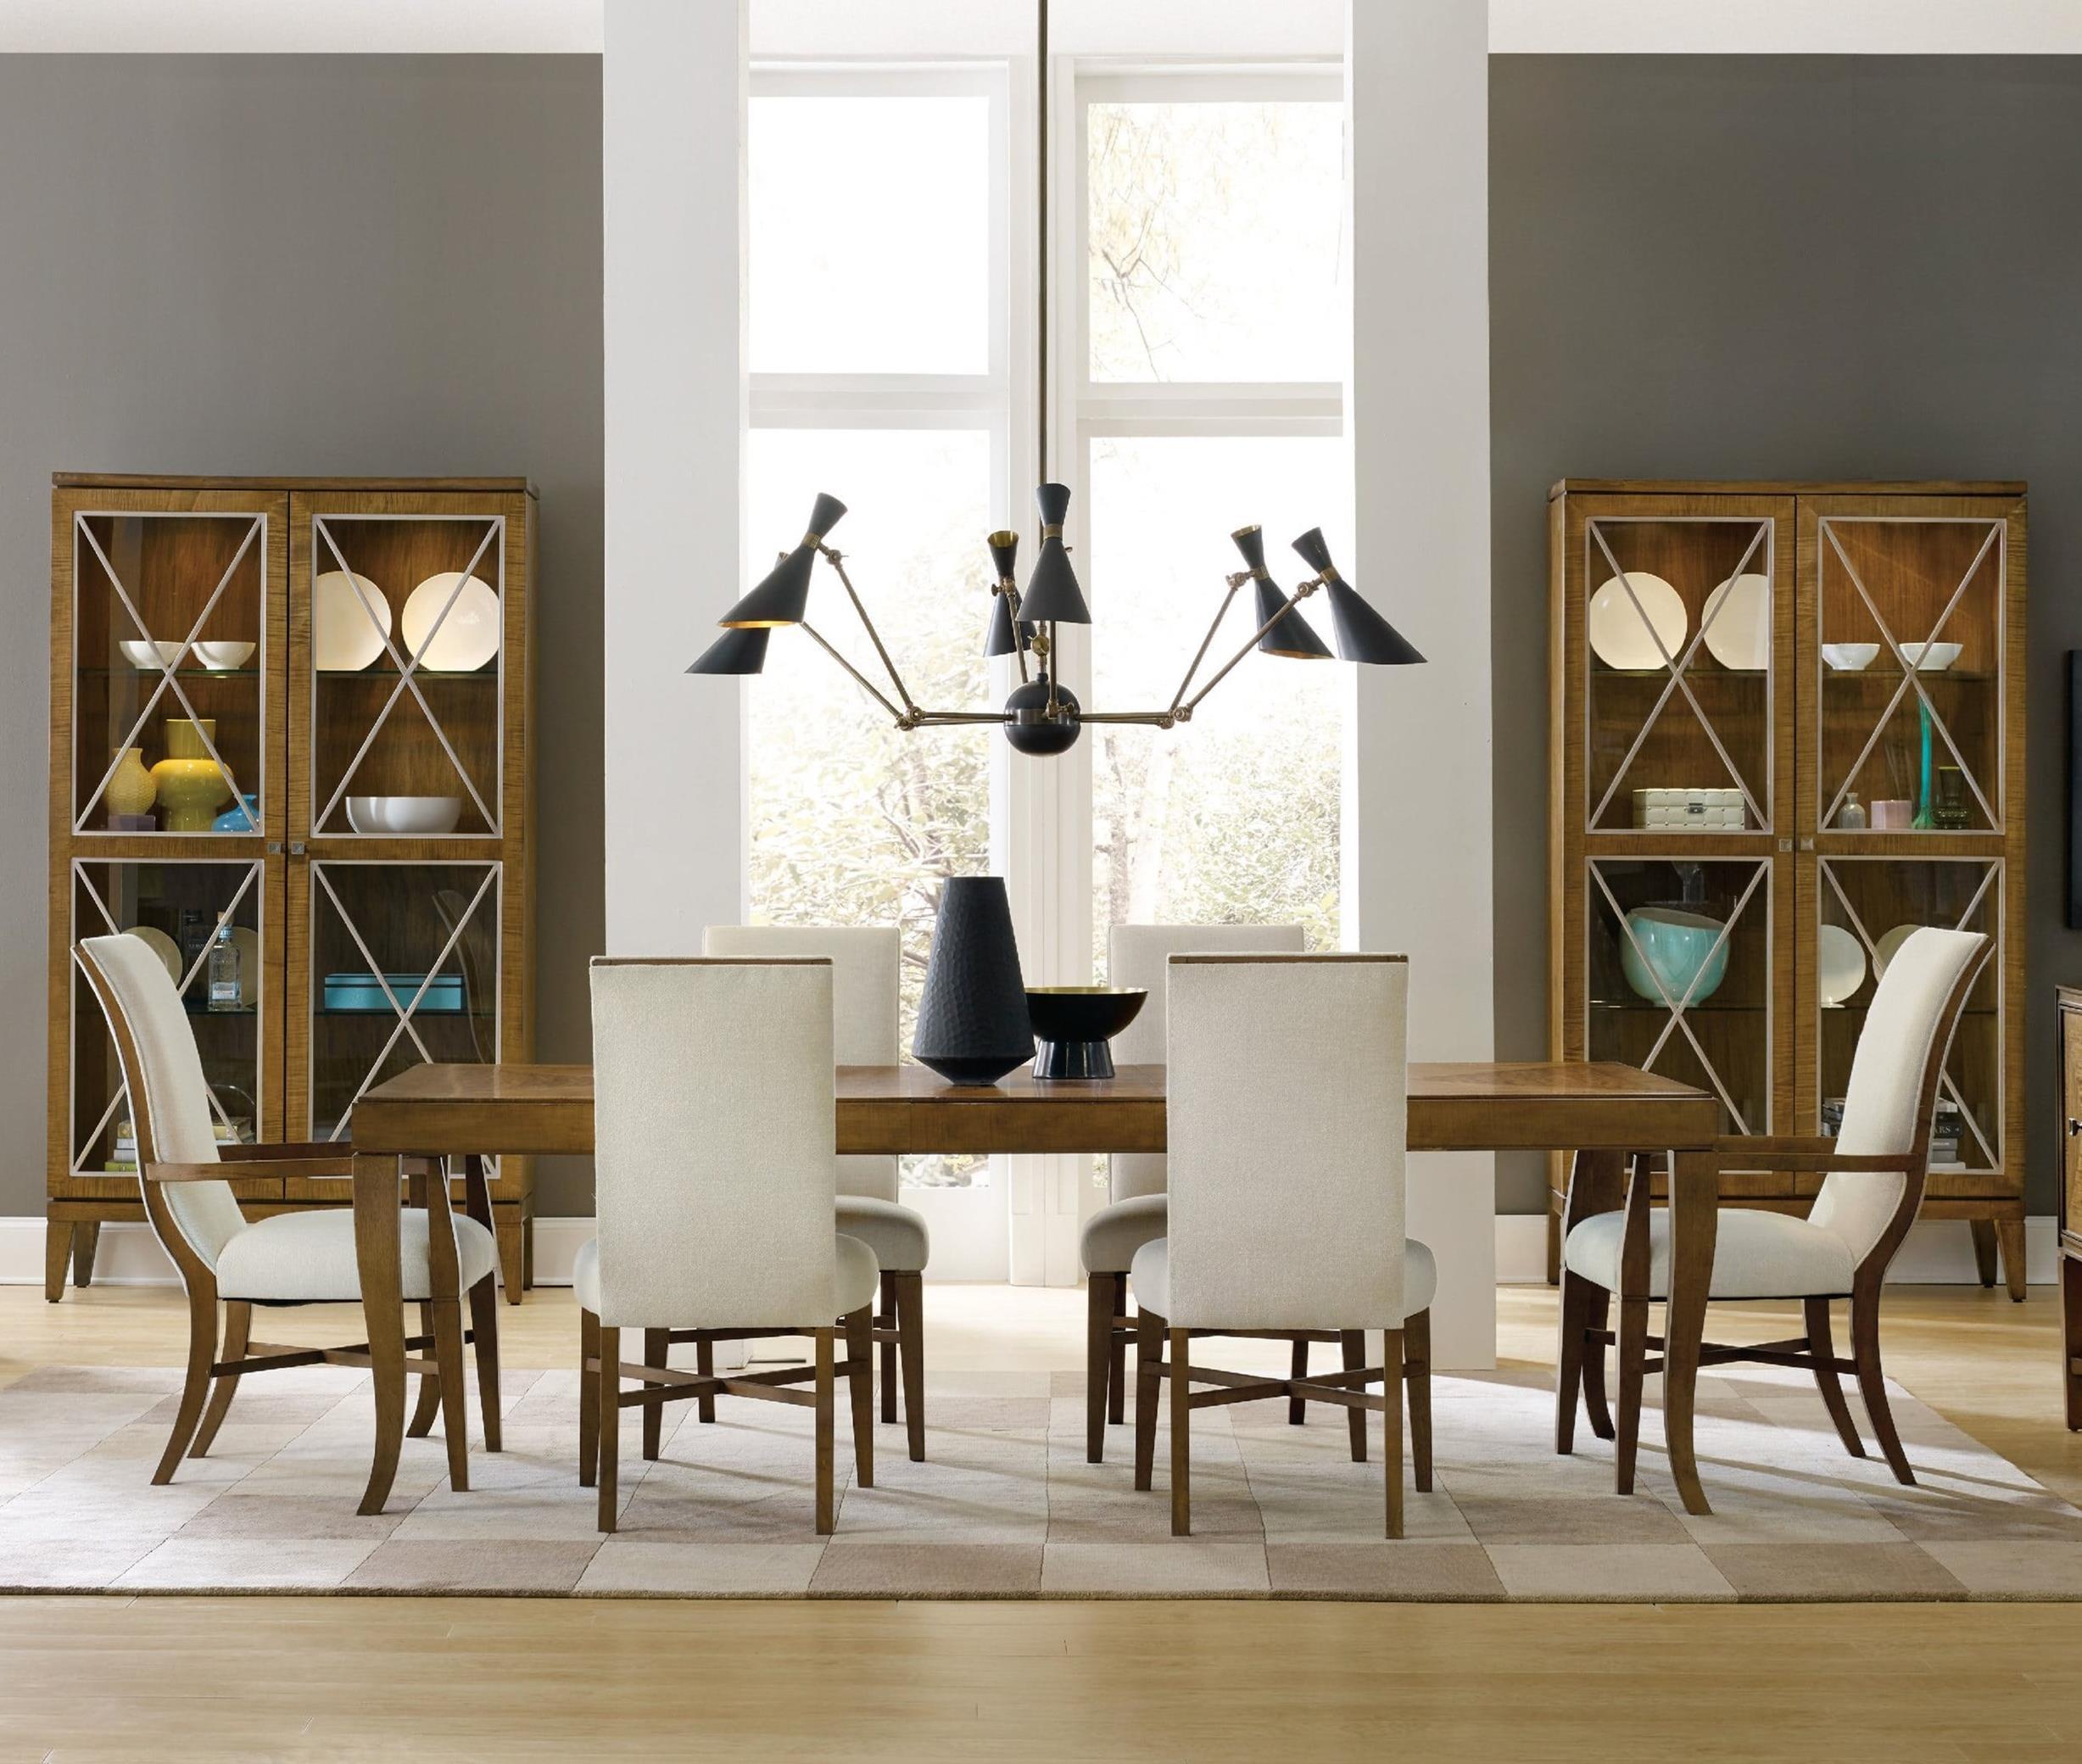 Hooker Furniture Retropolitan 7 Piece Table & Chair Set - Item Number: 5510-75200-MWD+2x75500+4x75510